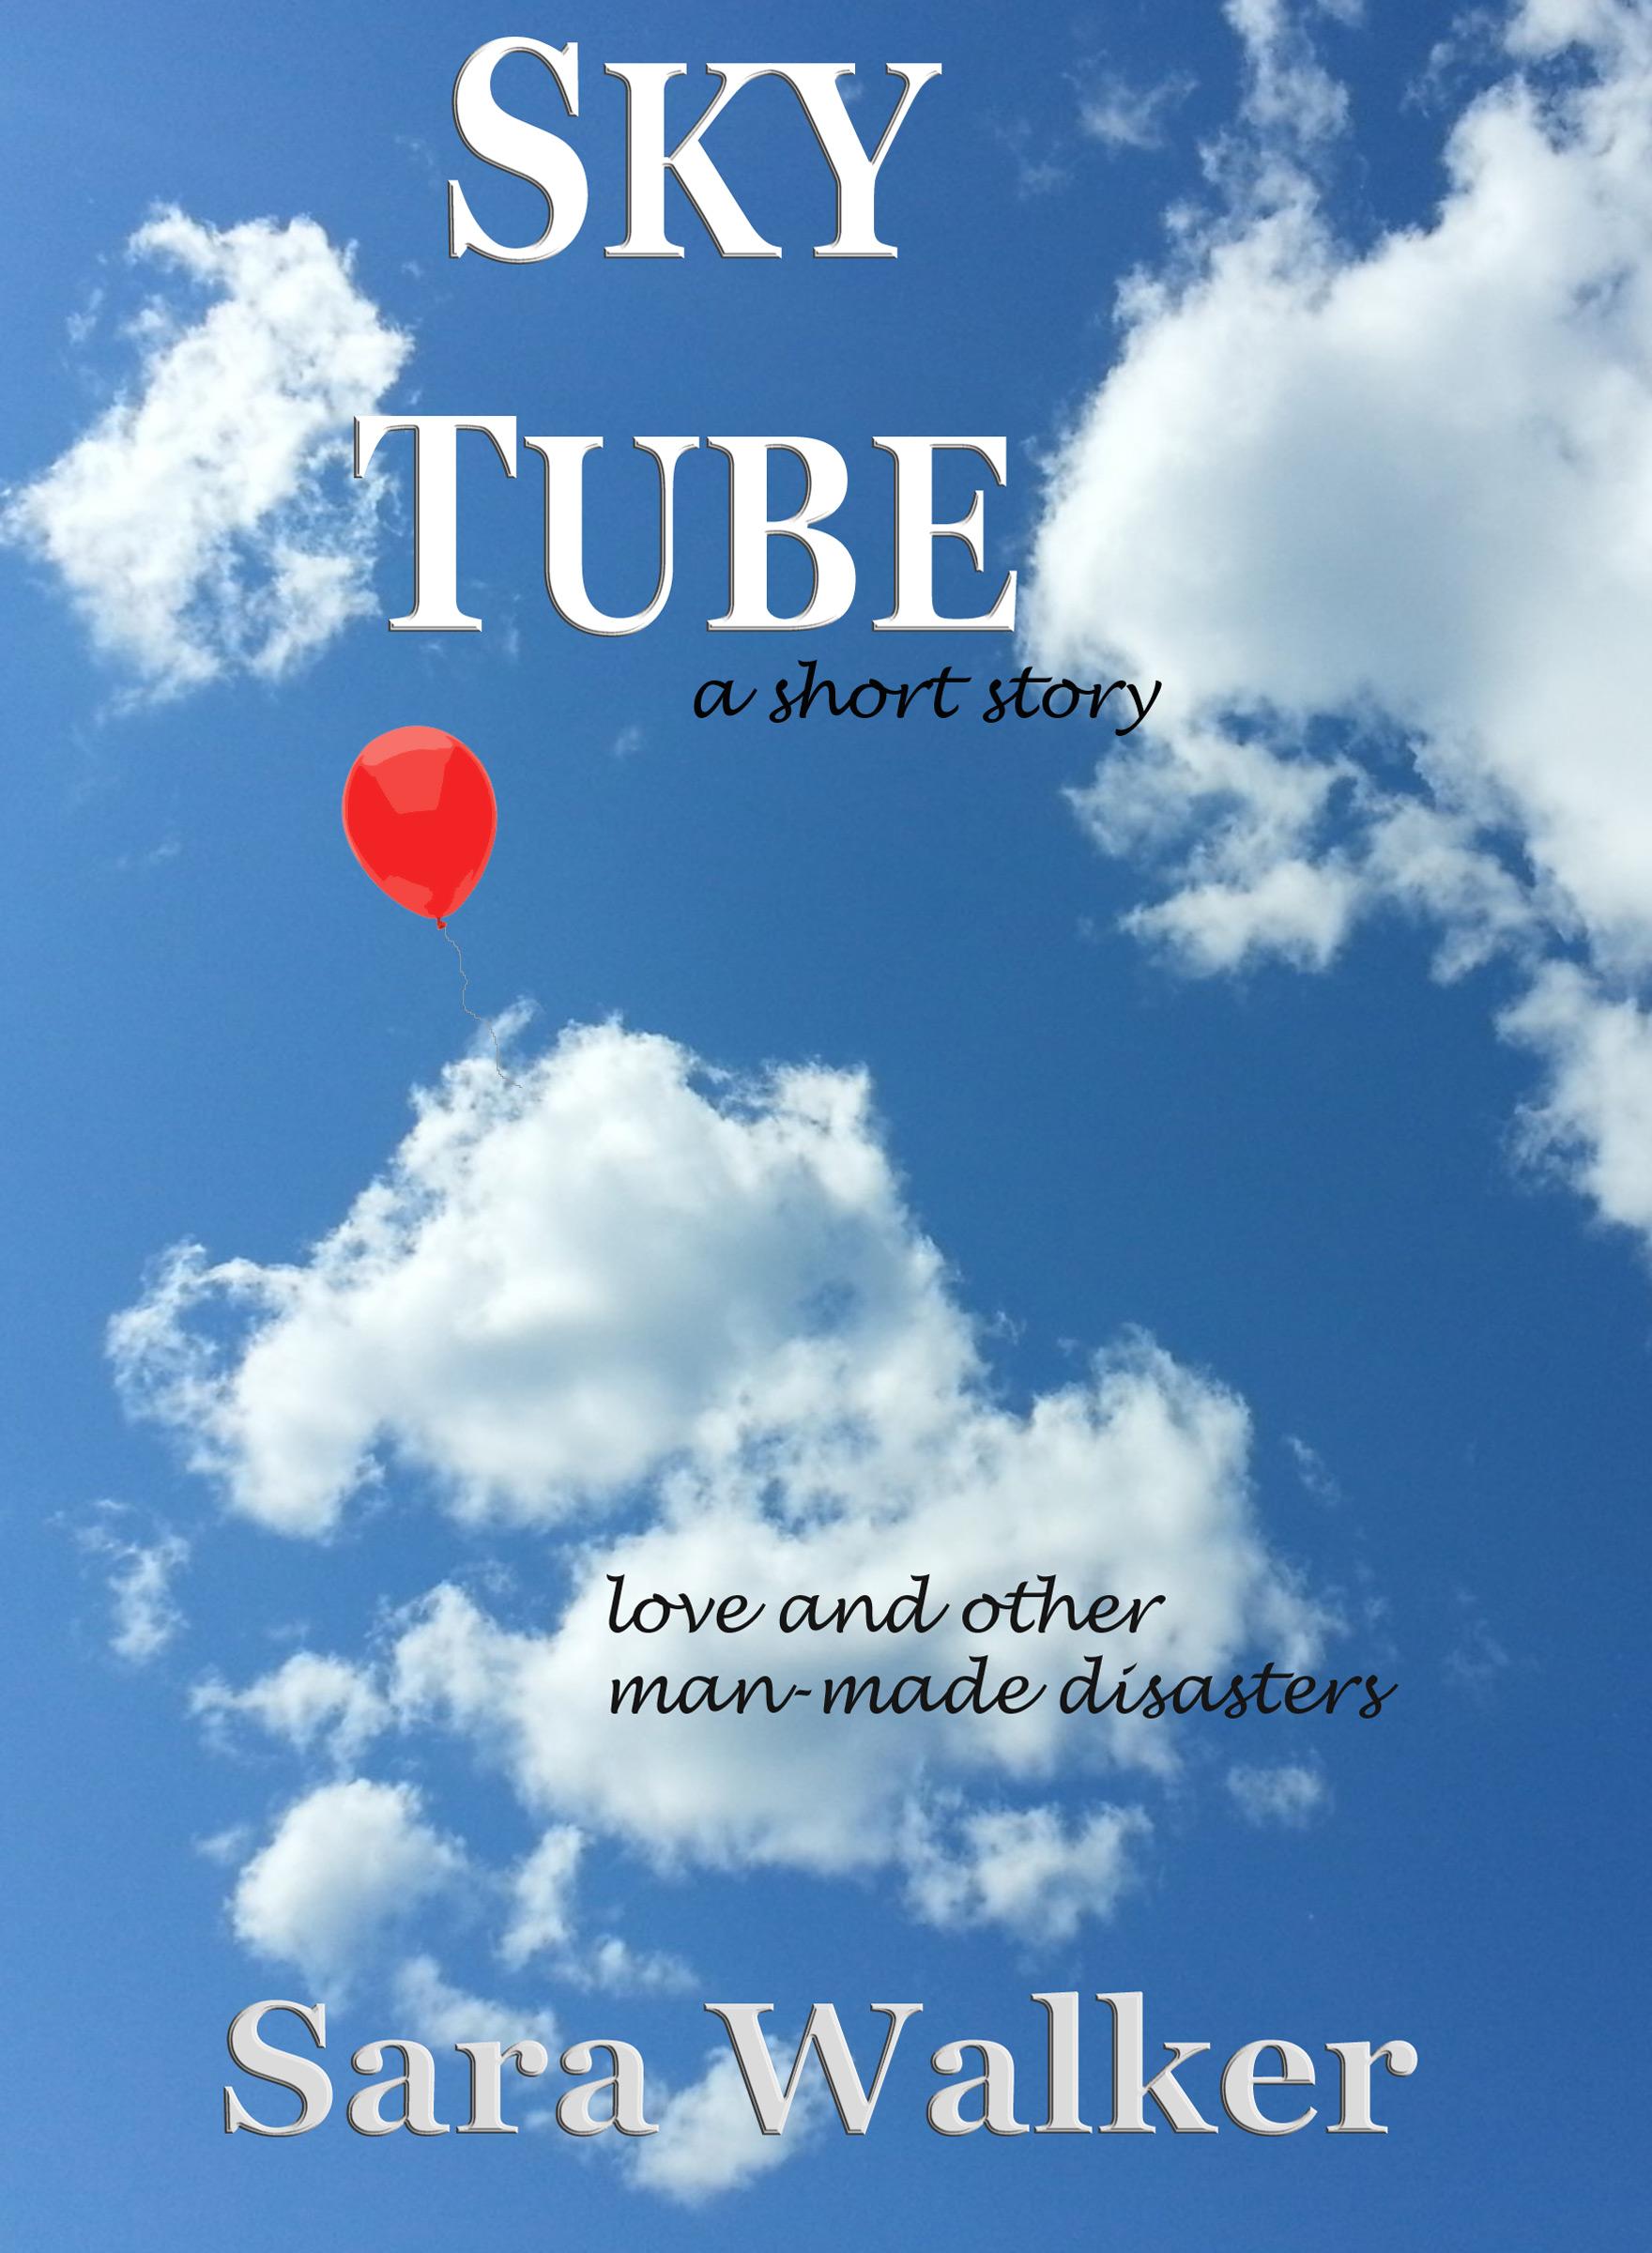 Sky Tube cover